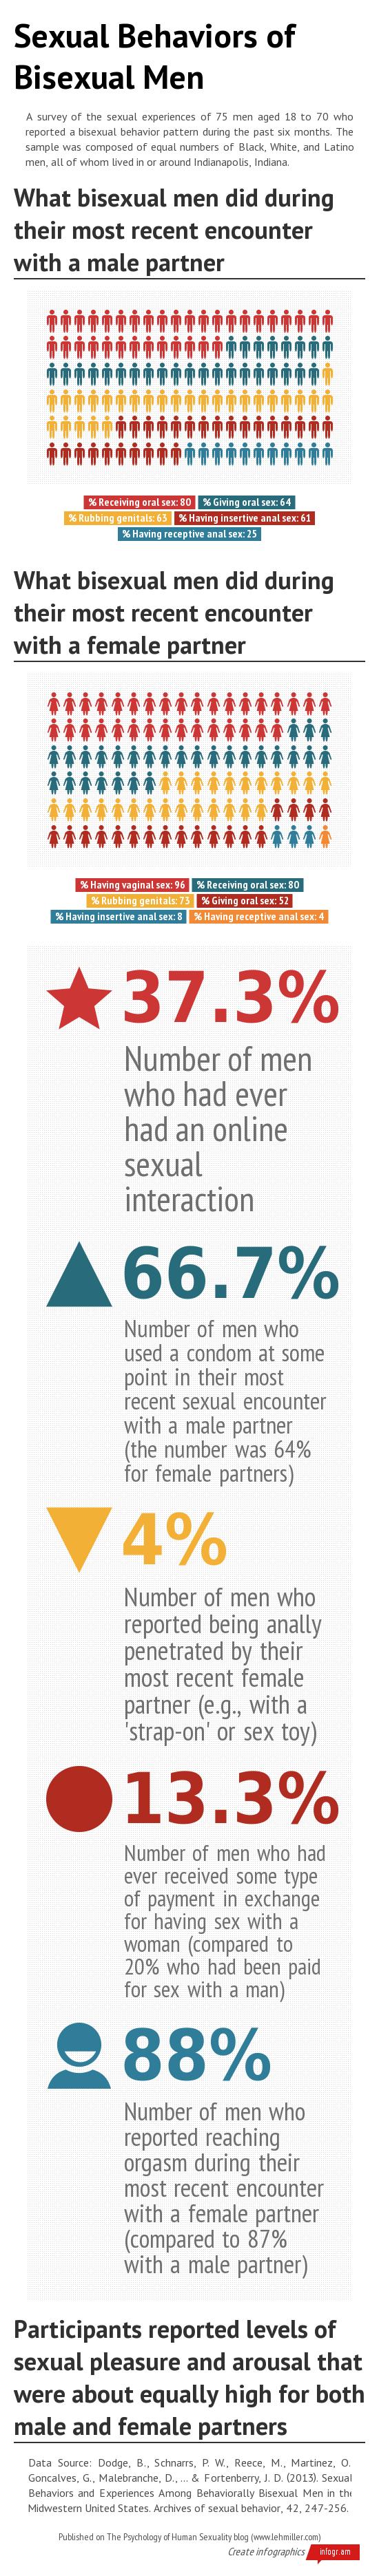 sexual-behaviors-of-bisexual-men.png